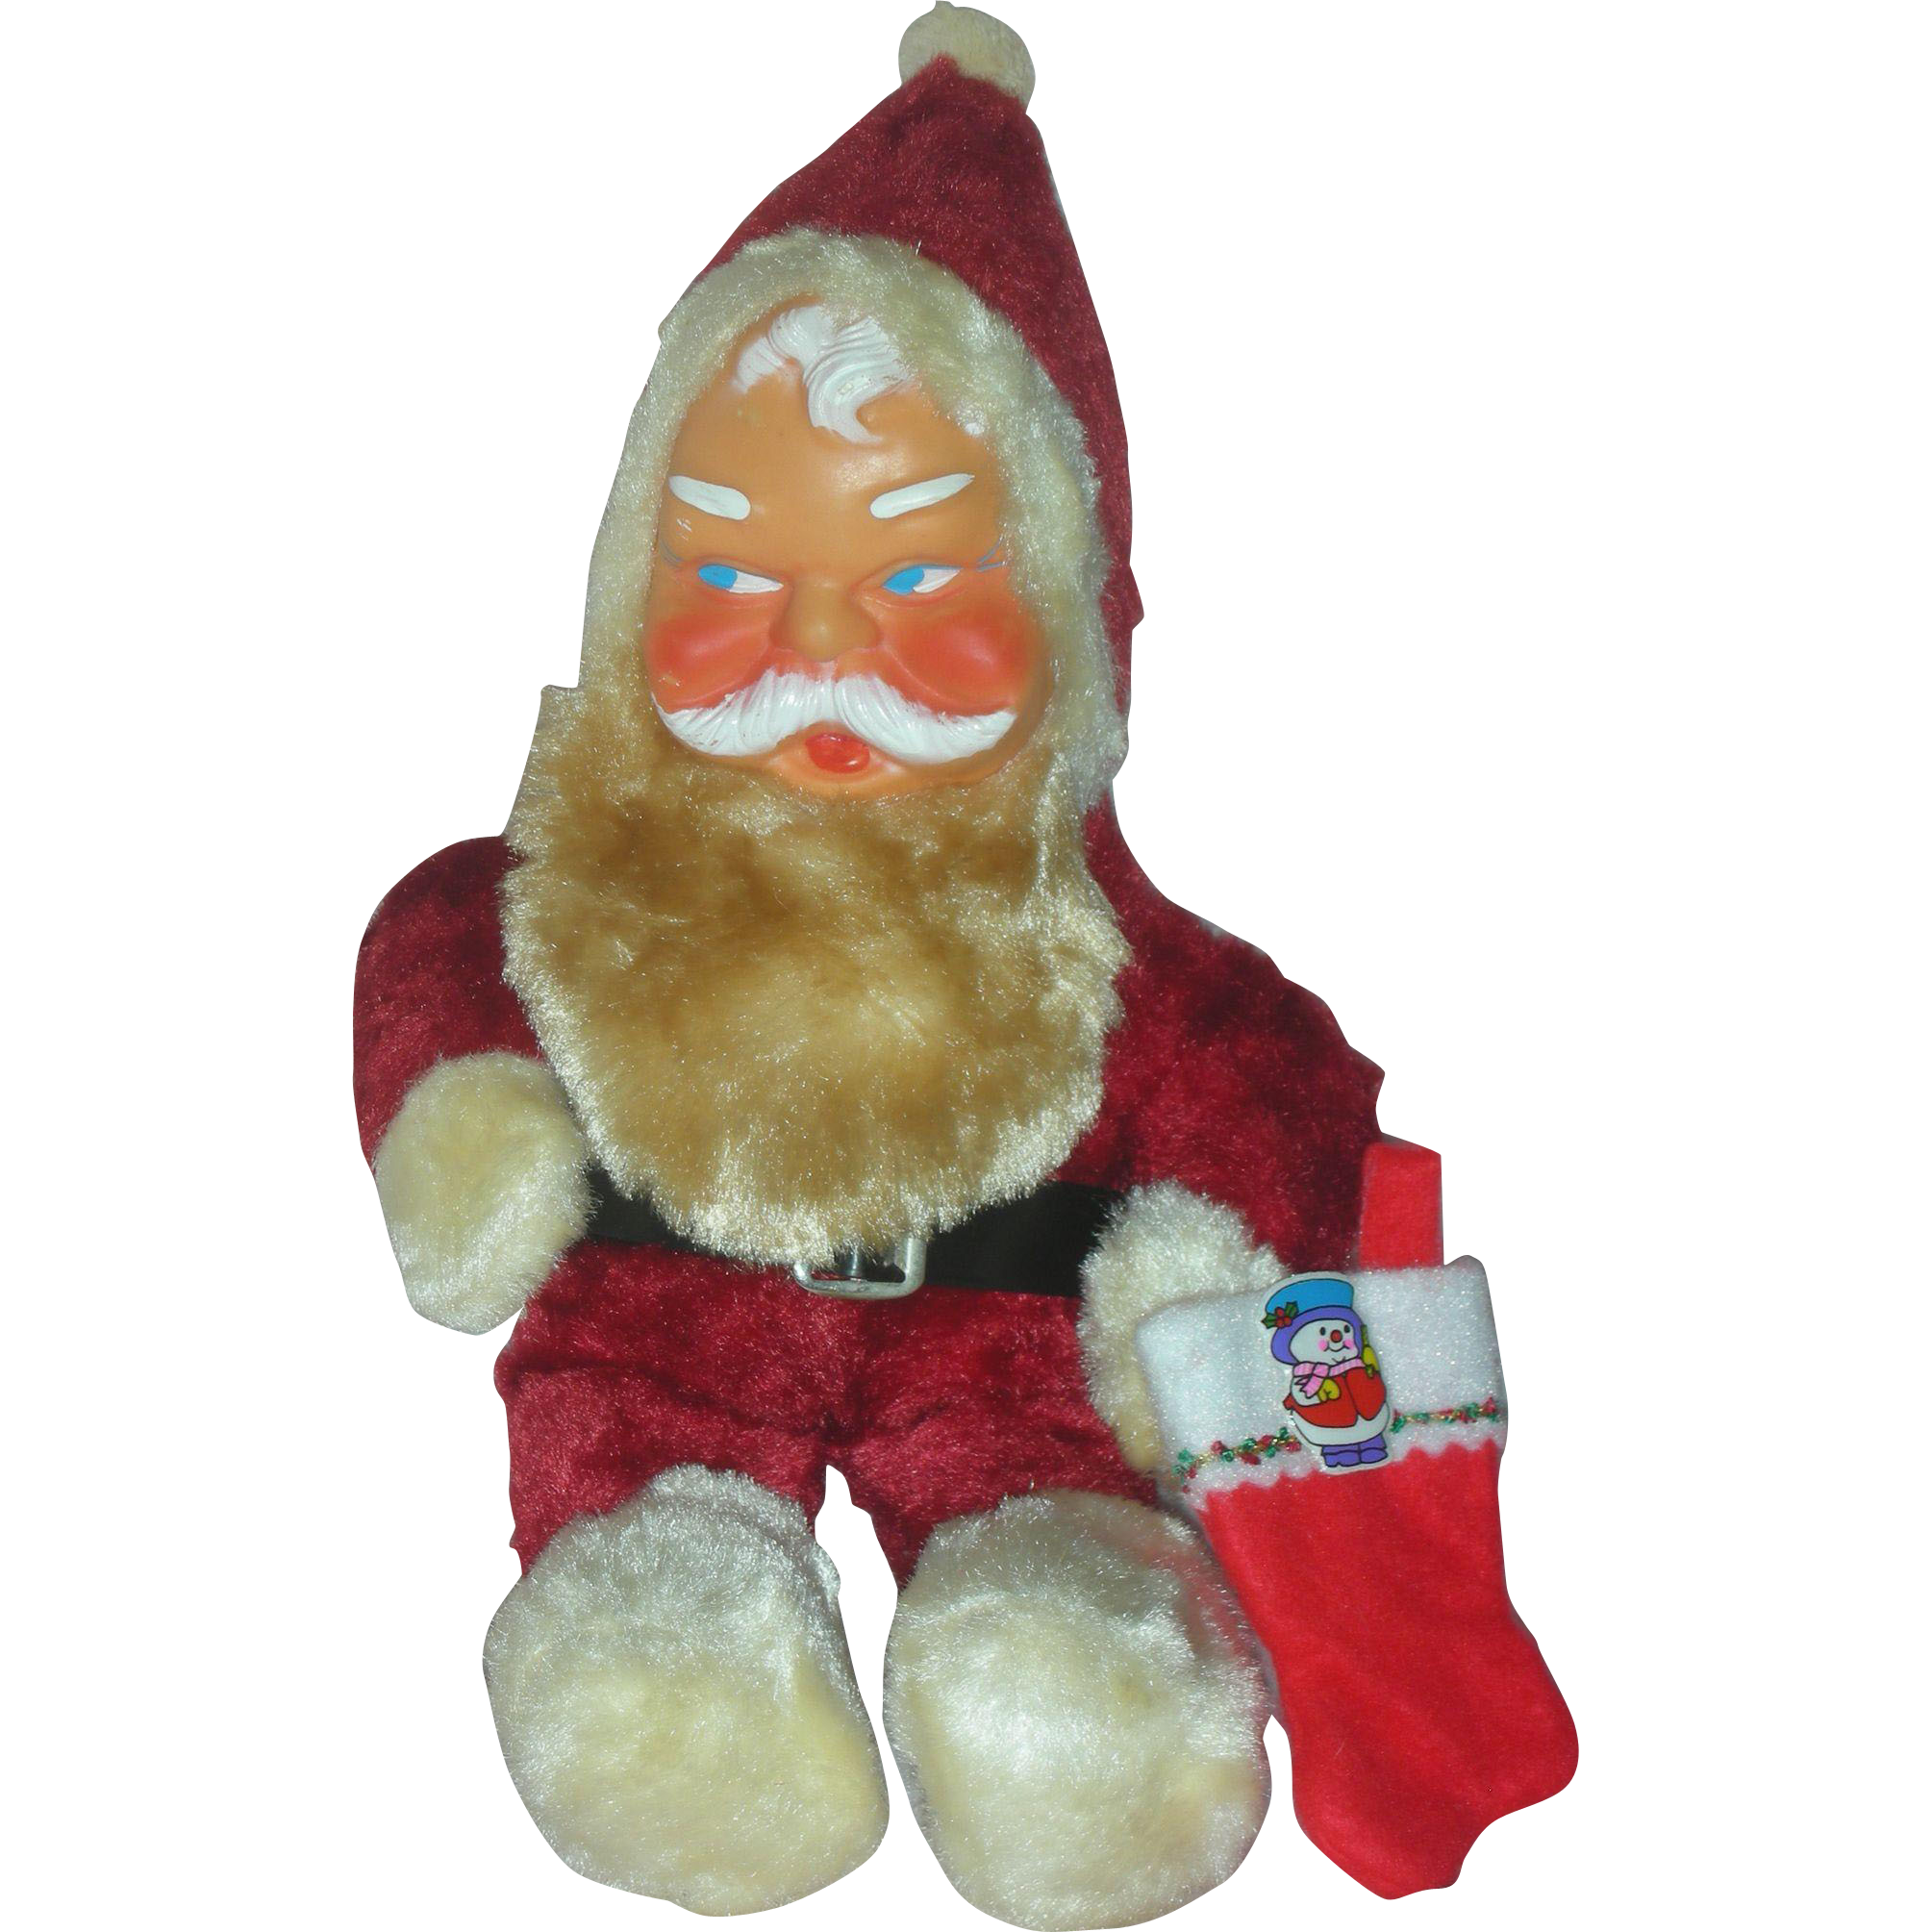 Vintage Rubber Face Toy Stuffed Santa Doll Mid Century Genie Toys